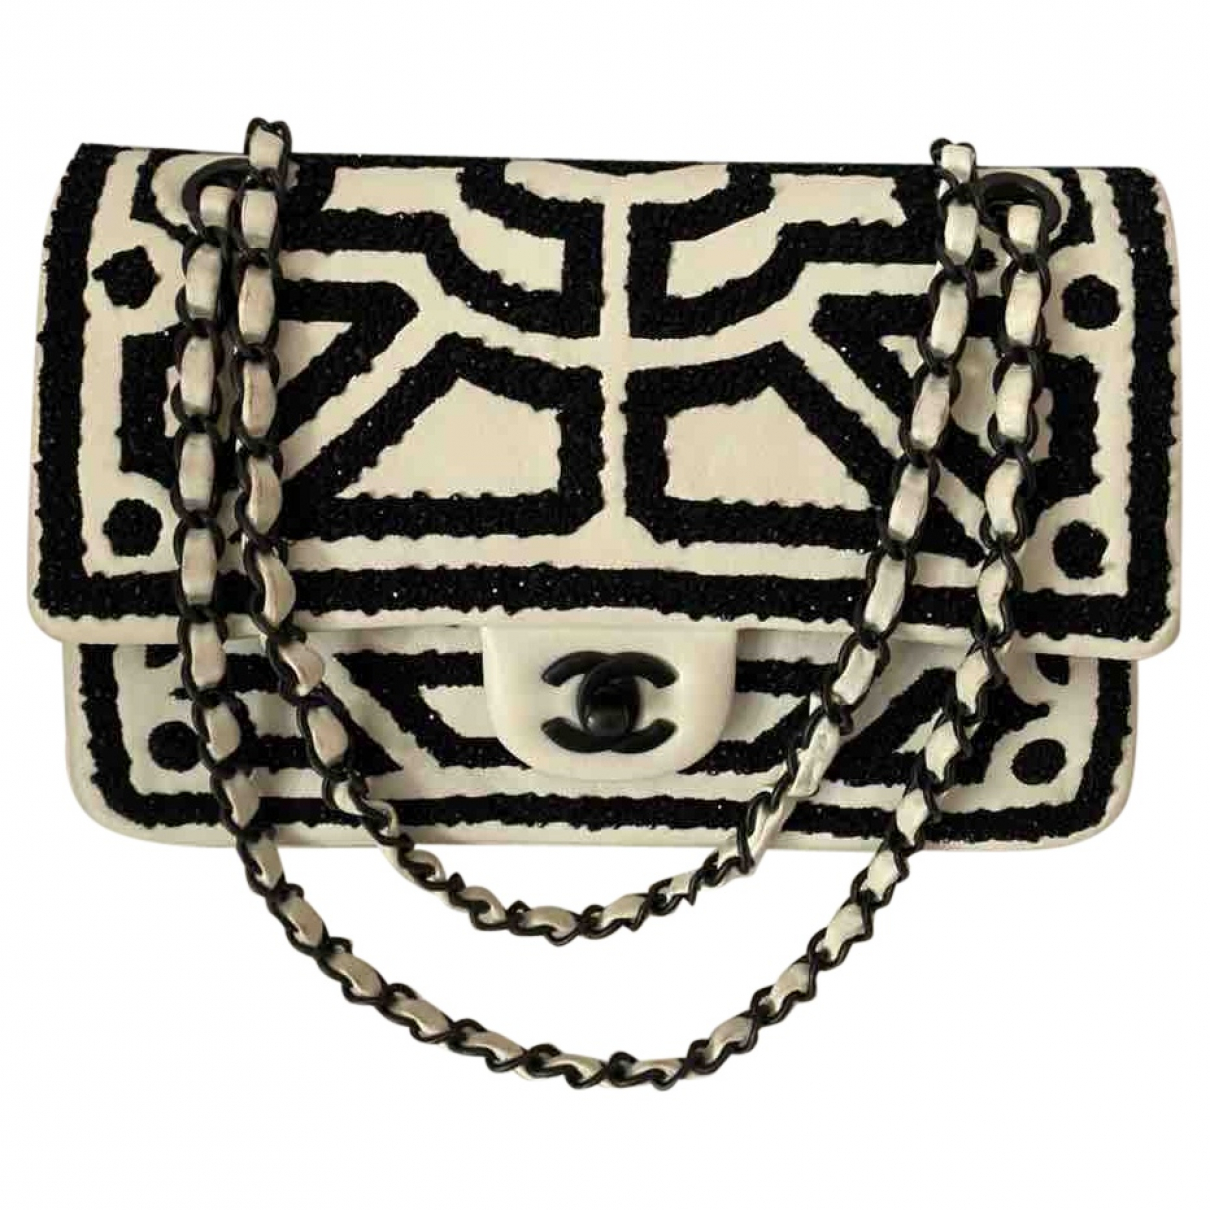 Chanel Timeless/Classique Handtasche in  Weiss Leder